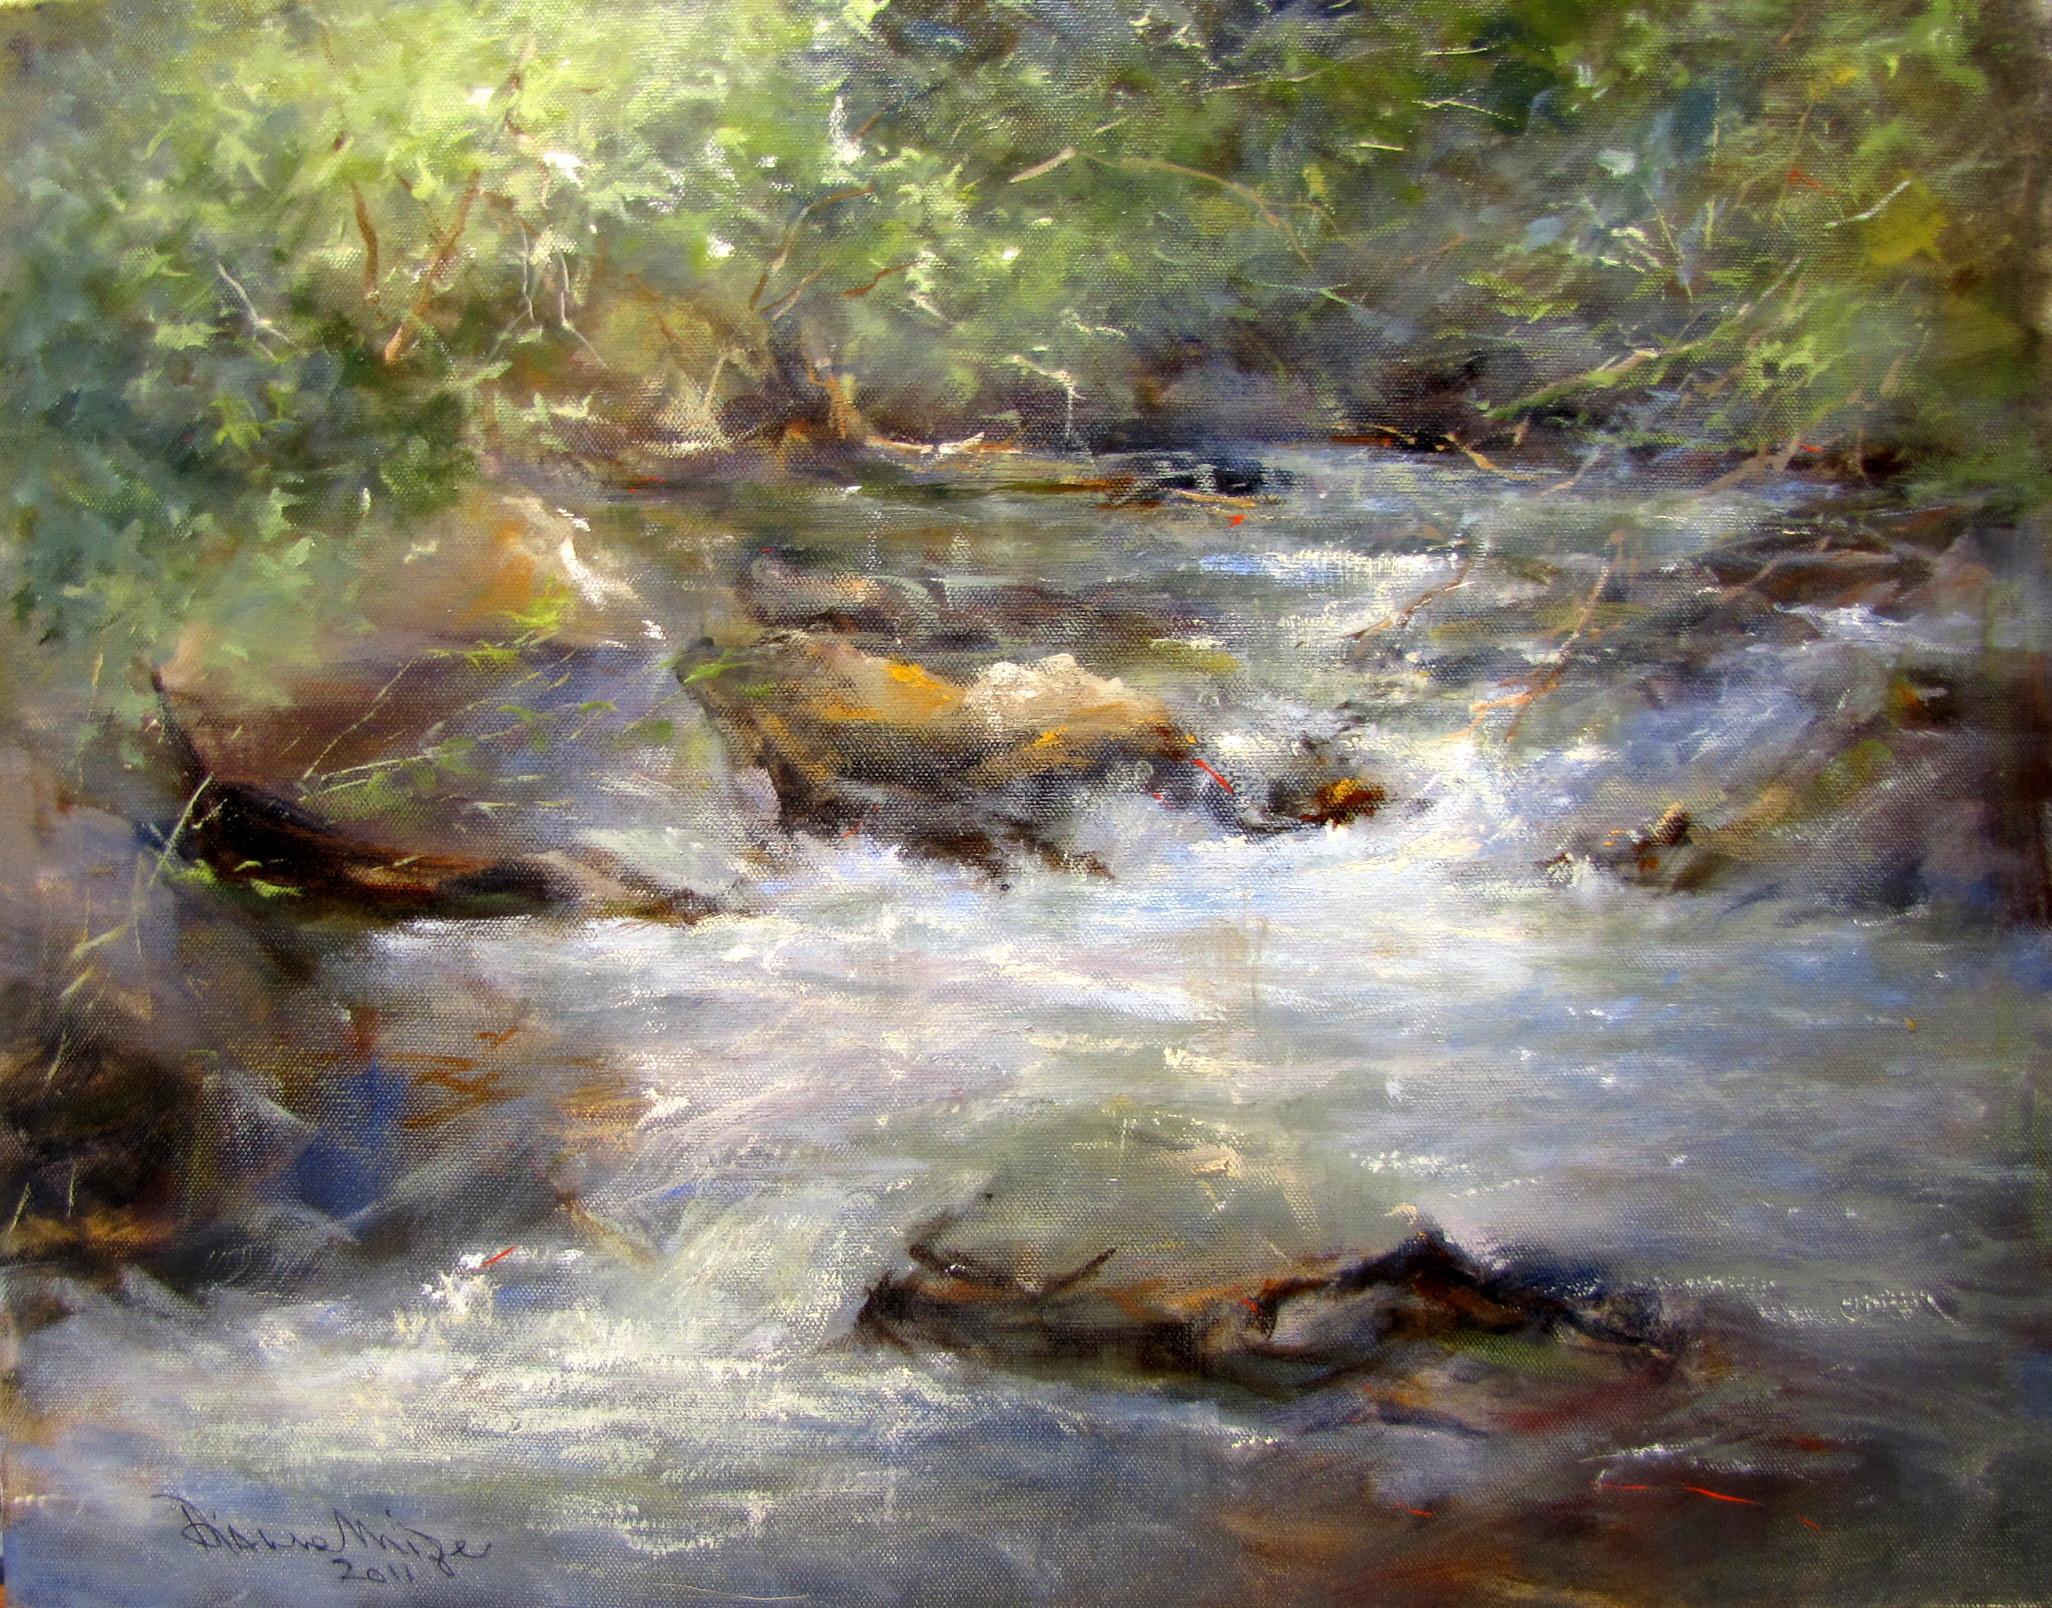 """Tallulah, Late September"" original fine art by Dianne Mize"